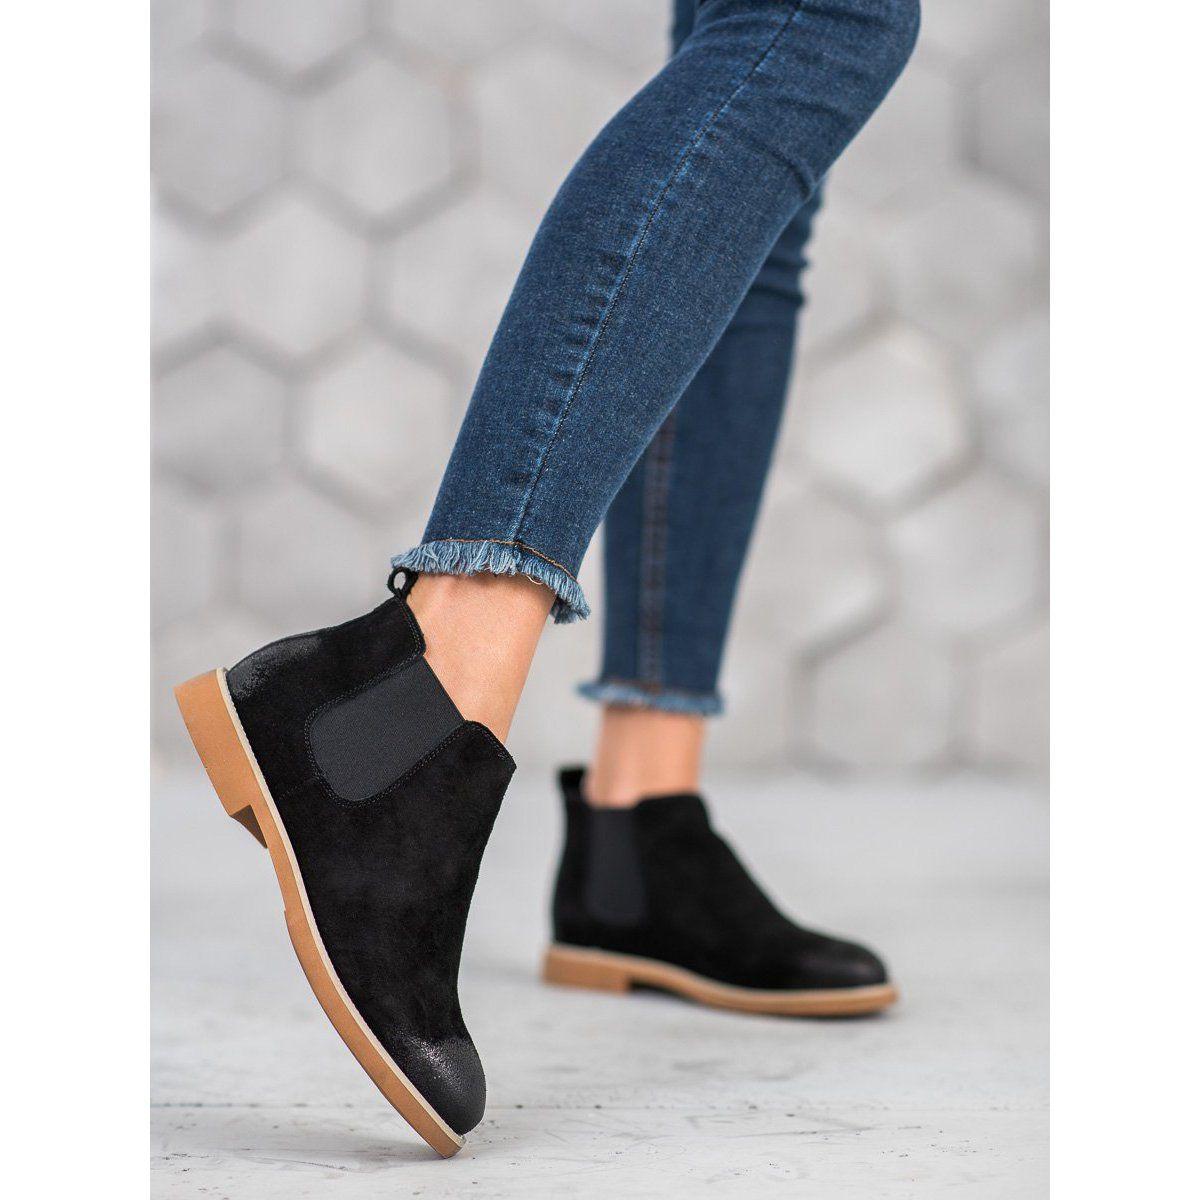 Sds Skorzane Sztyblety Czarne Jodhpur Boots Black Boots Boots